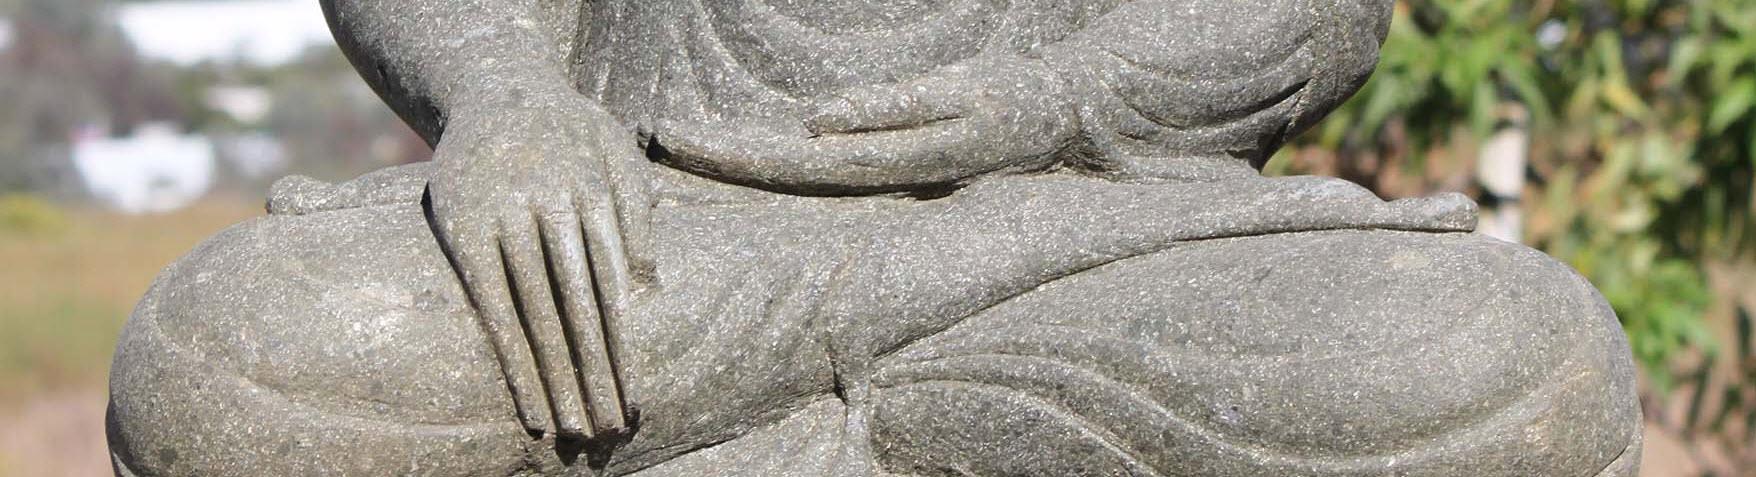 2019-06-21-Bhumisparsha-mudra.jpg